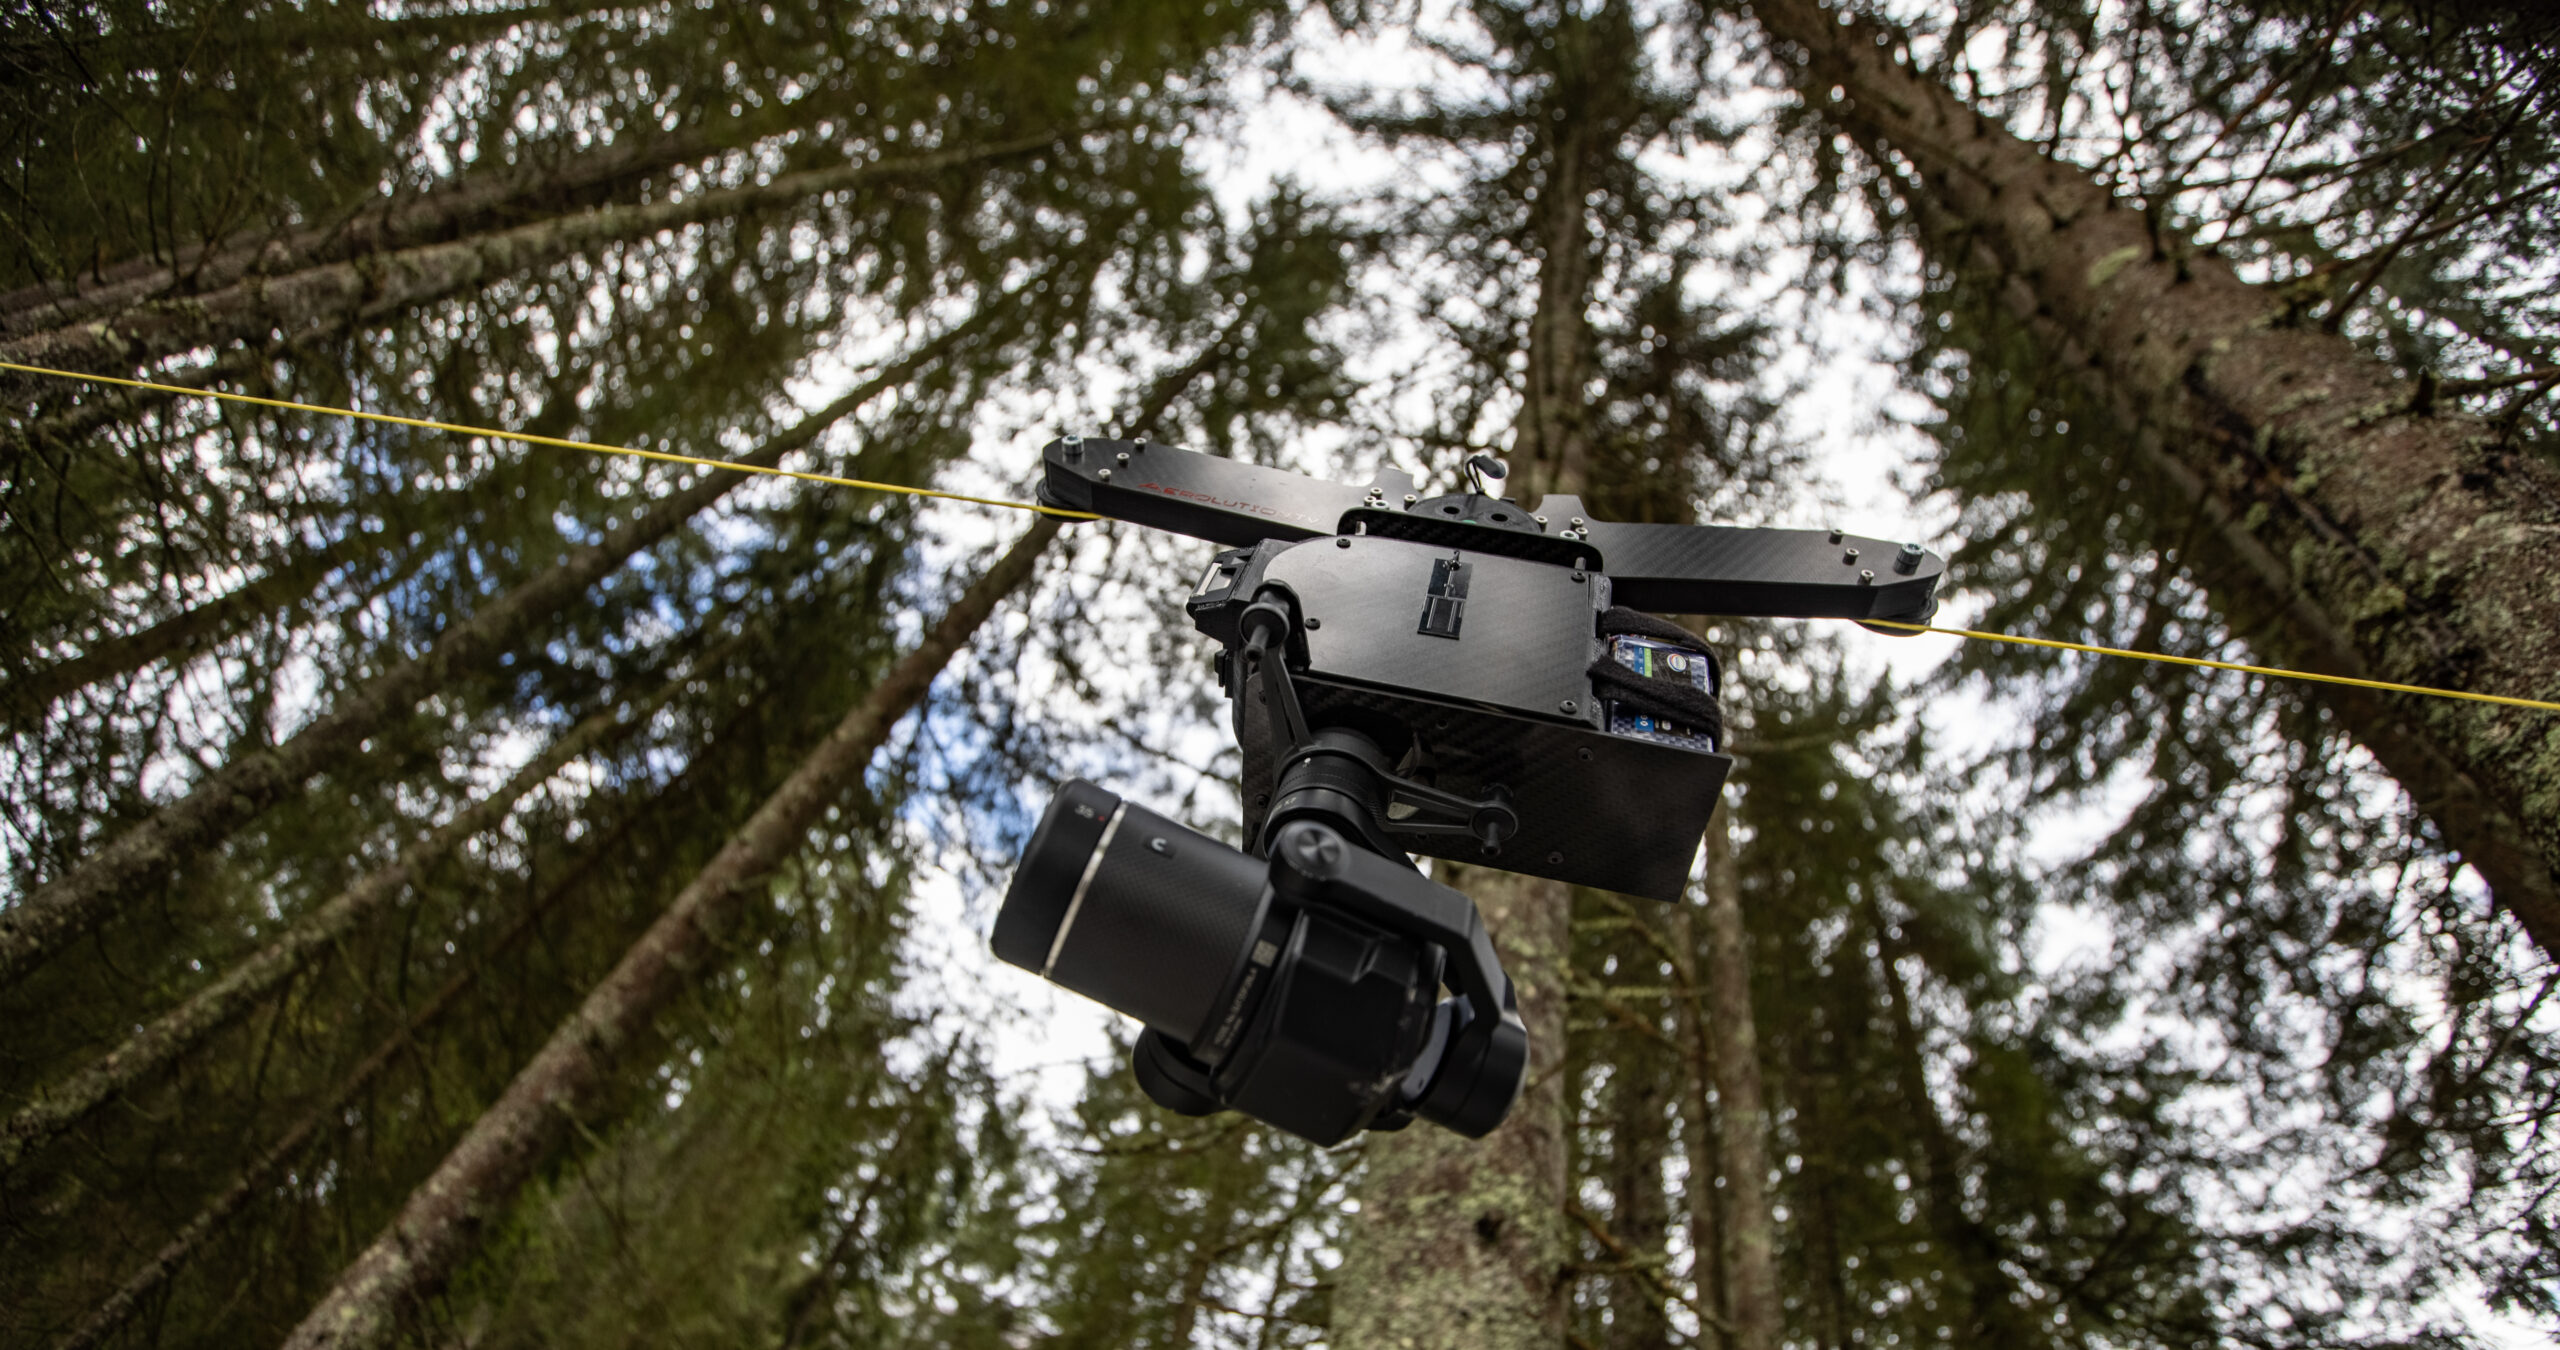 CableCam Seilkamera Rope cam wire cam Kamera bewegte Kamerafhrten Filmset Filmaufnahmen dynmaisch Drohnenpilot